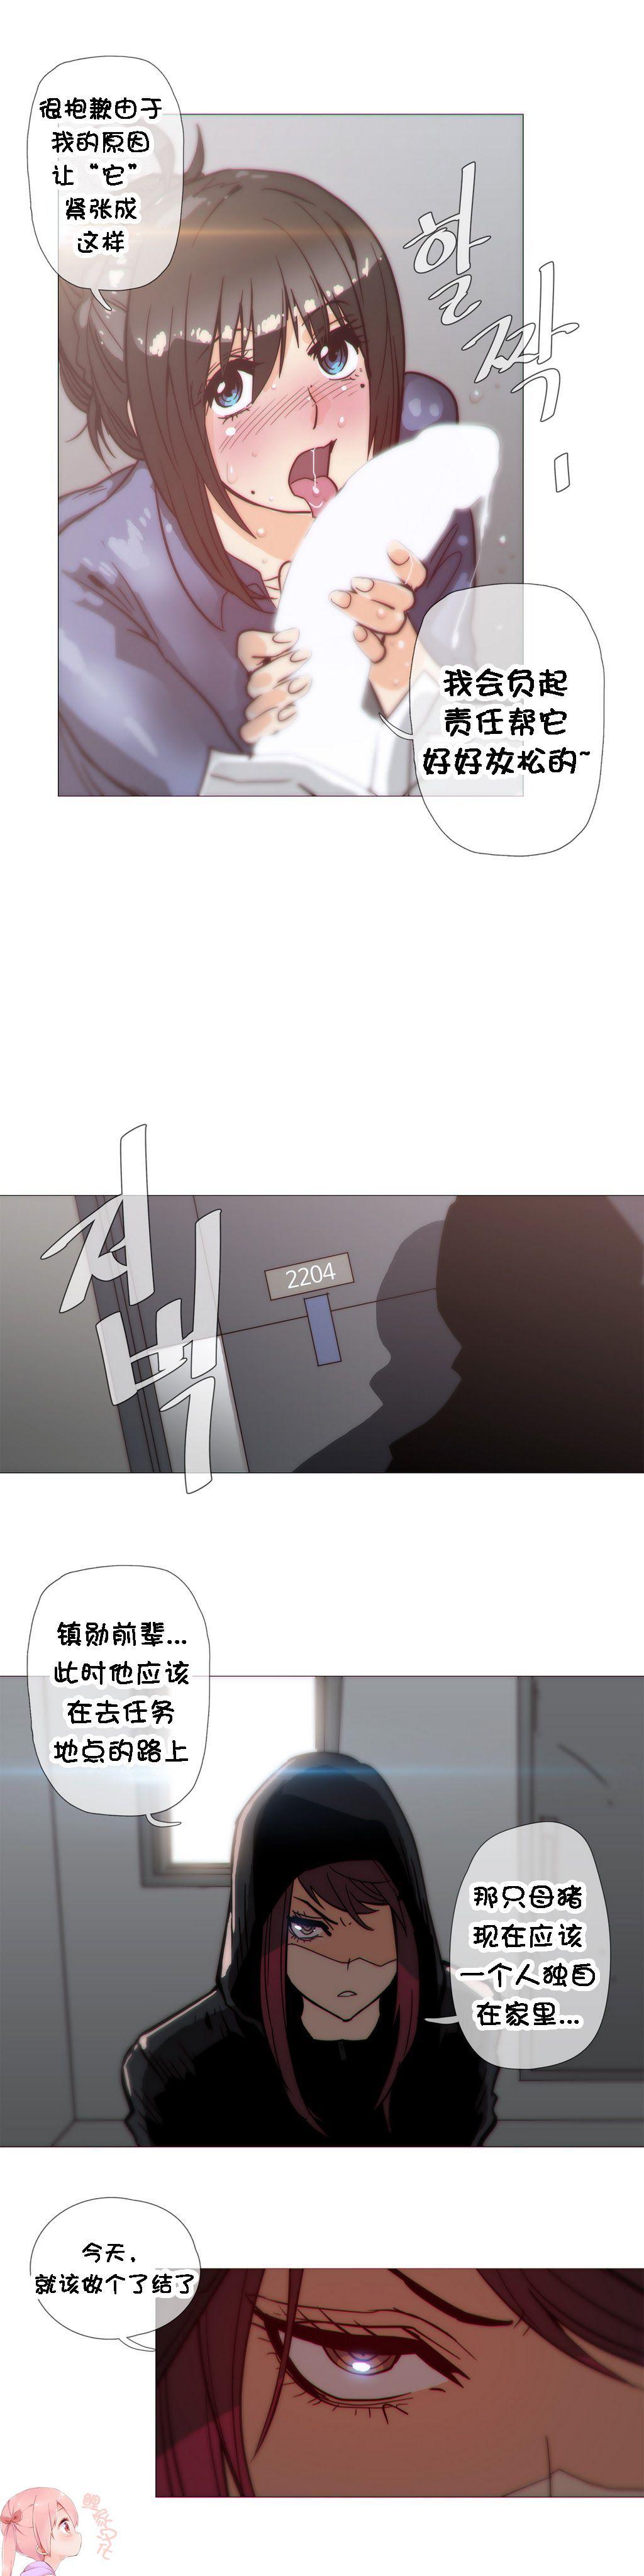 HouseHold Affairs 【卞赤鲤个人汉化】1~33话(持续更新中) 688